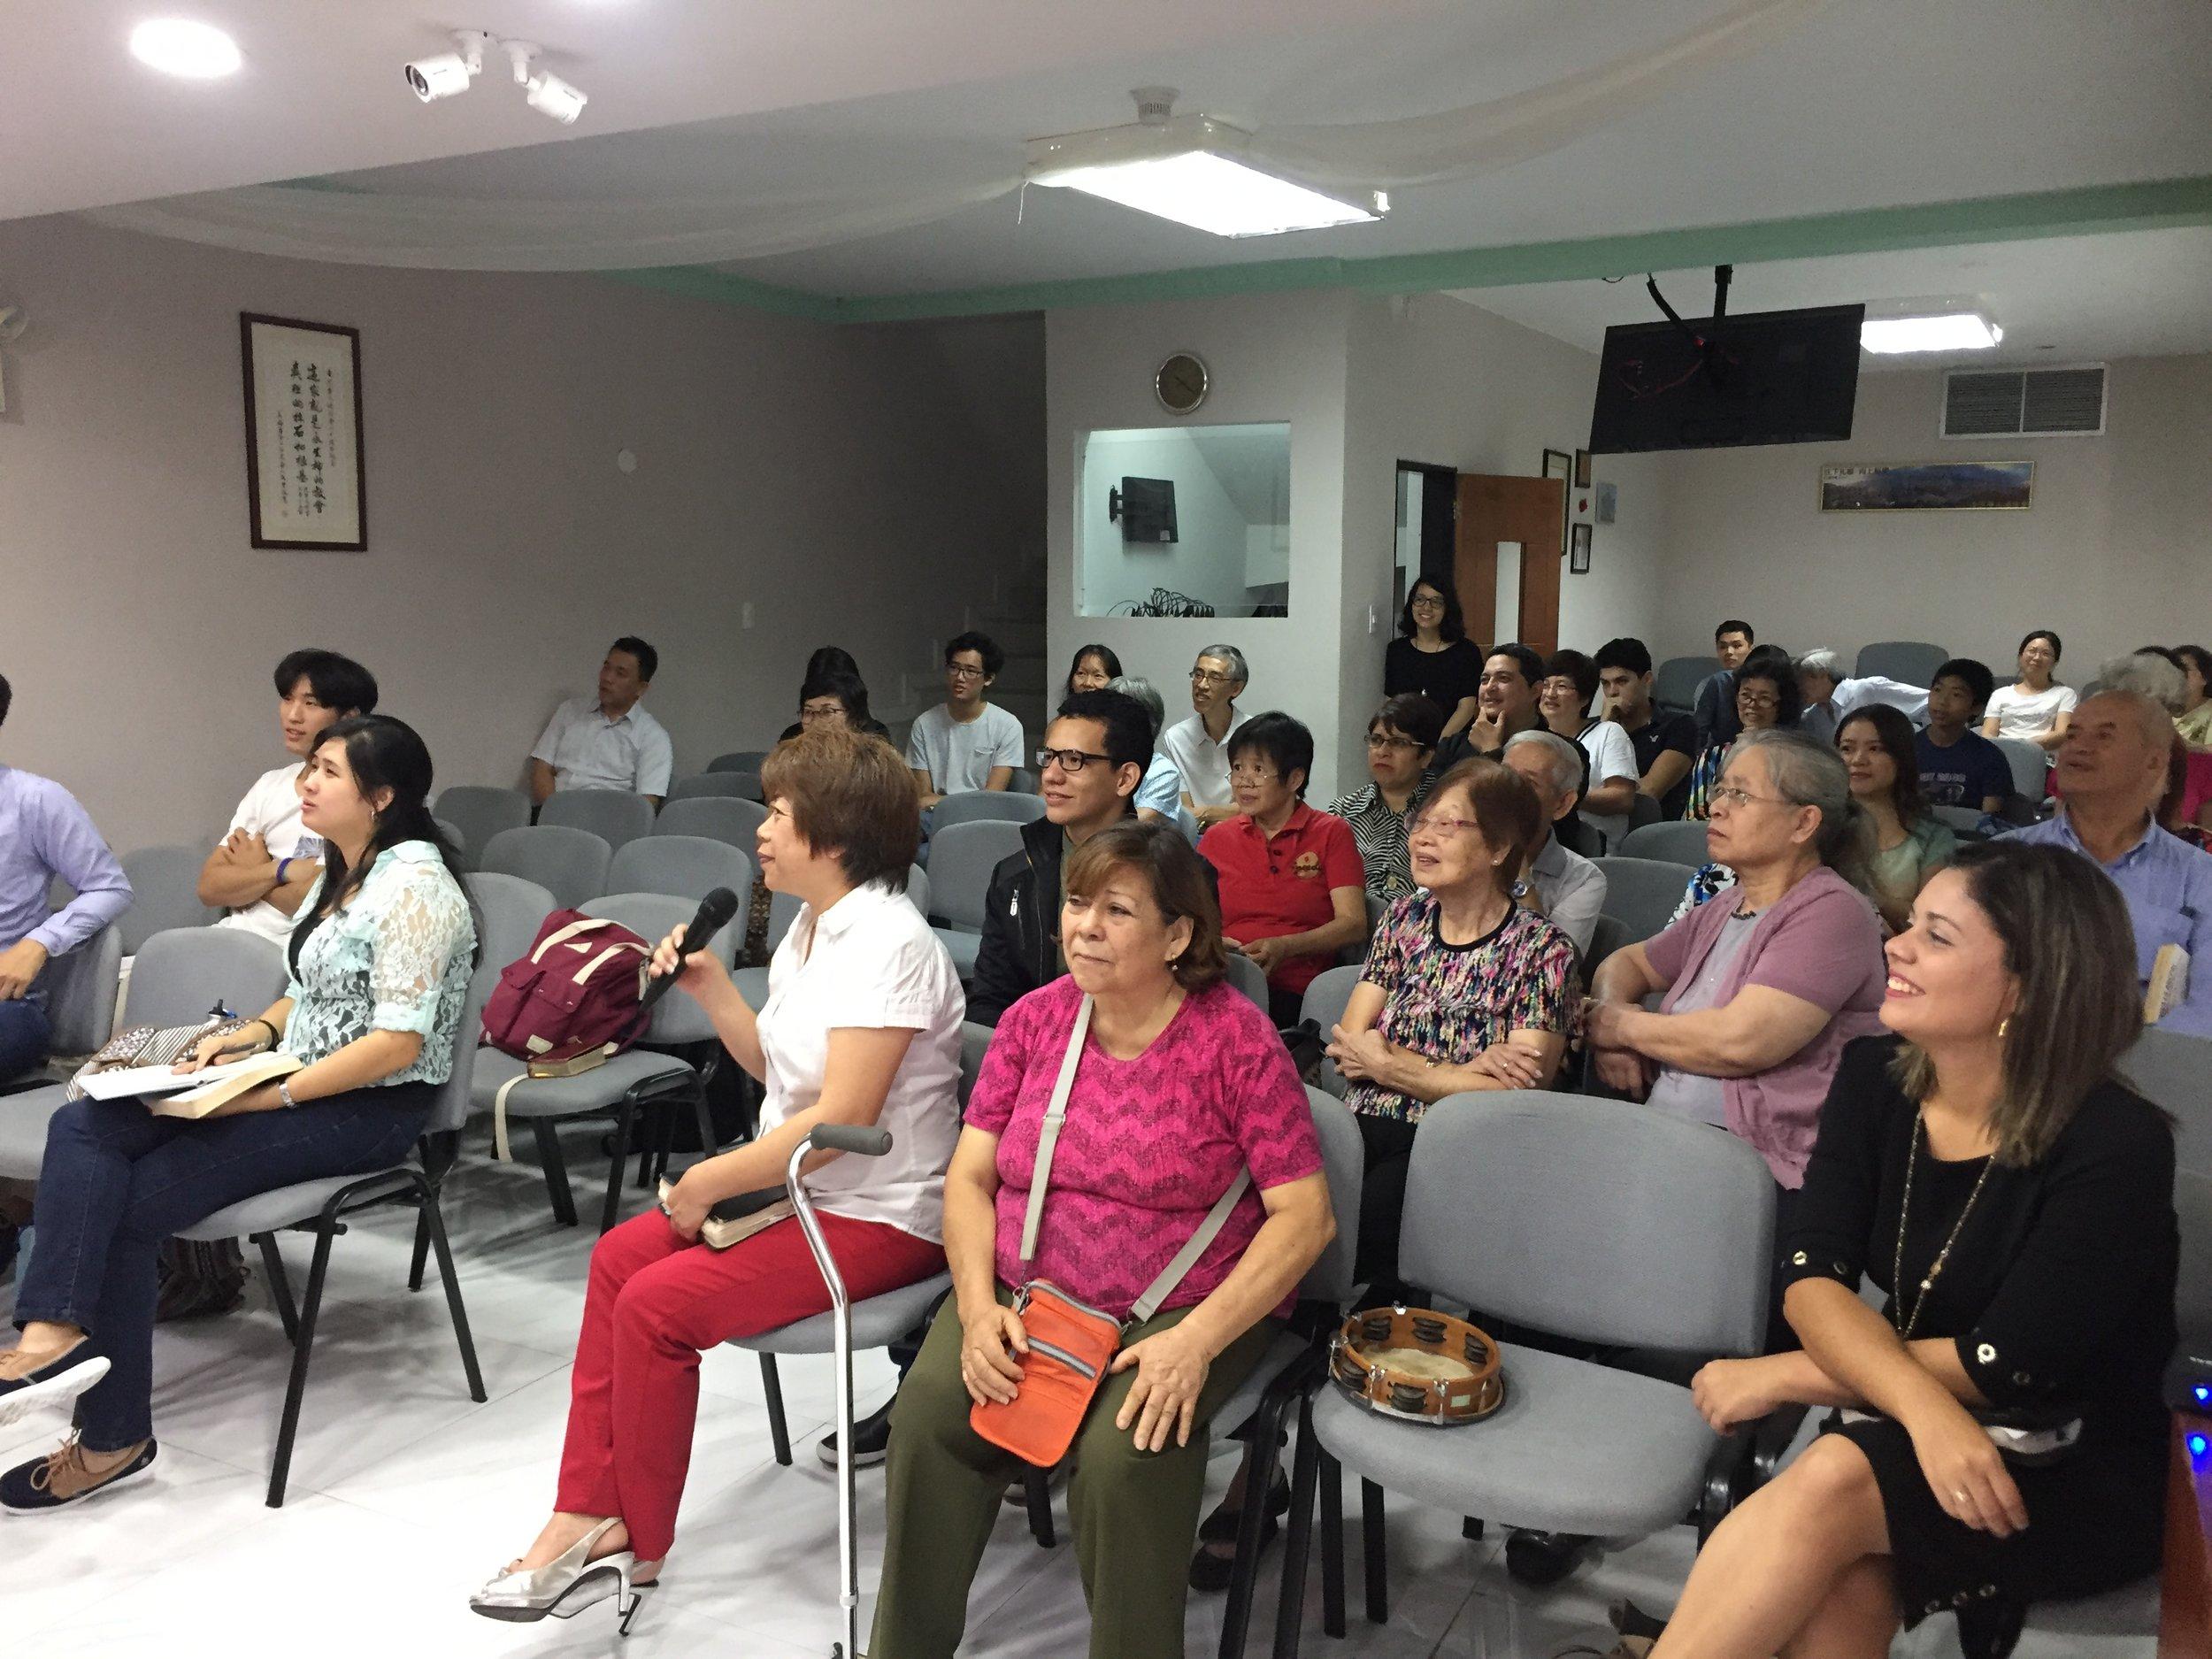 My home church, Iglesia Bautista China de Caracas